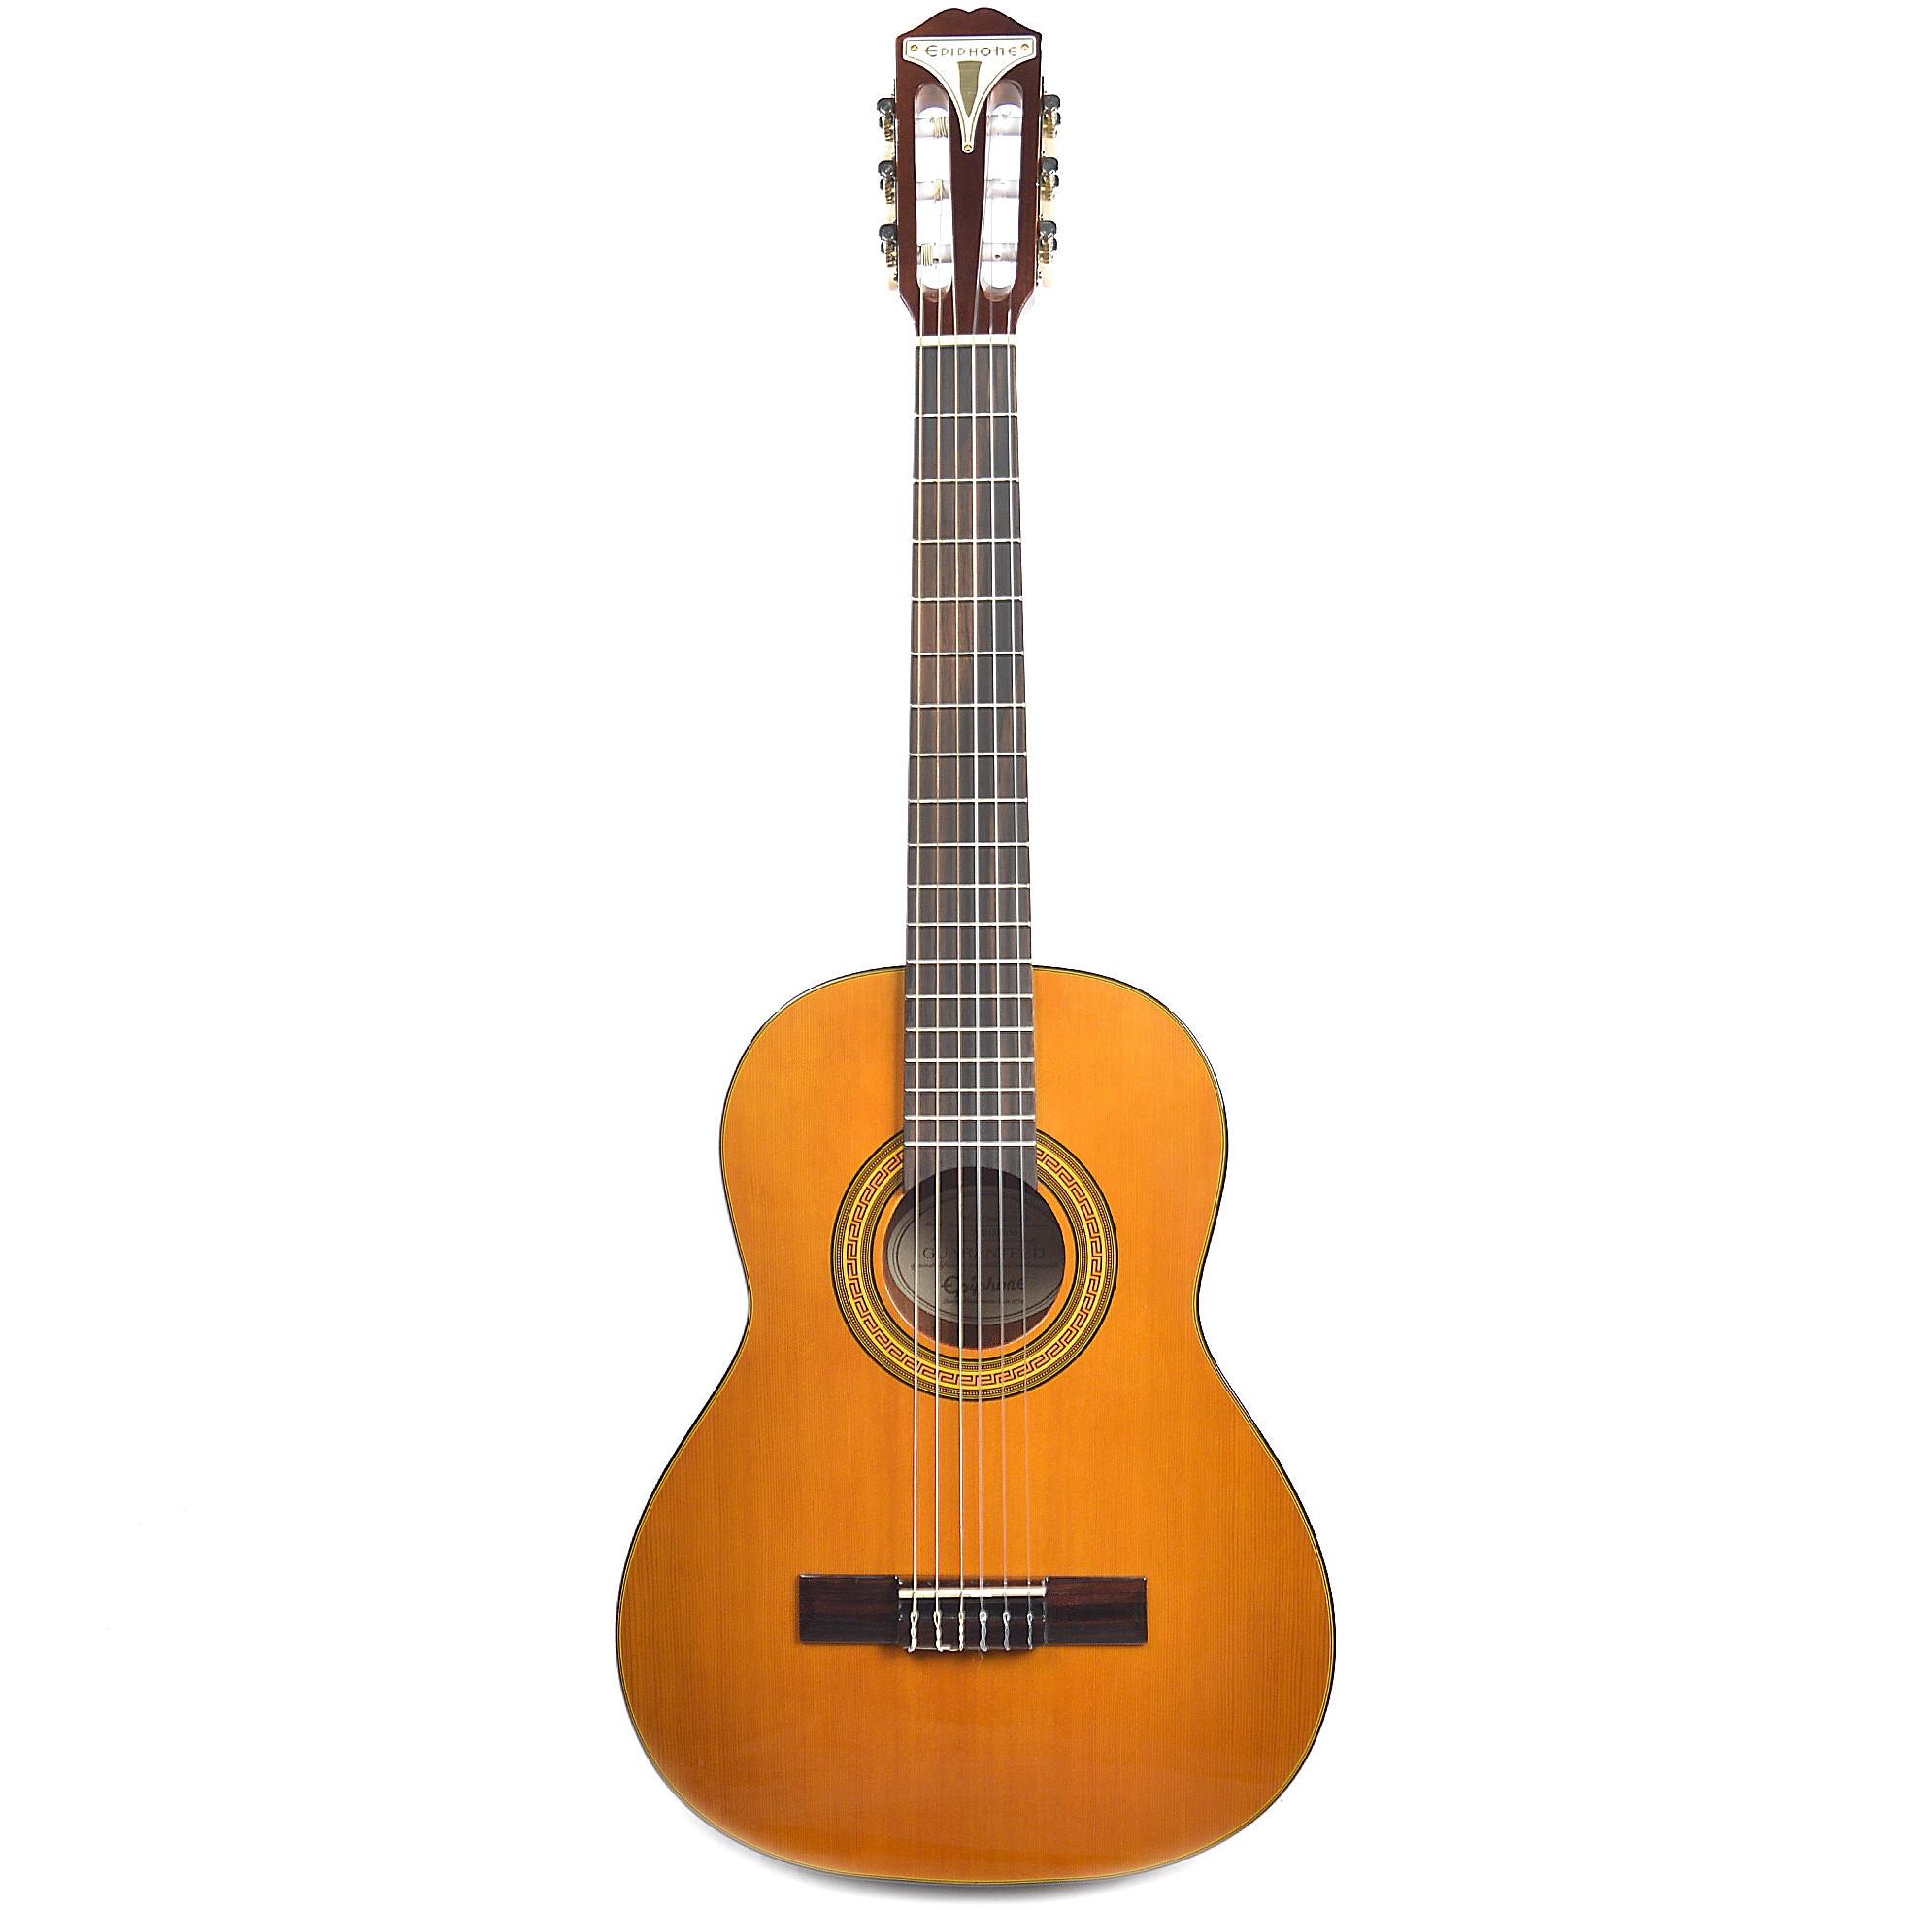 Epiphone PRO-1 Classic 3/4 Size Acoustic Guitar